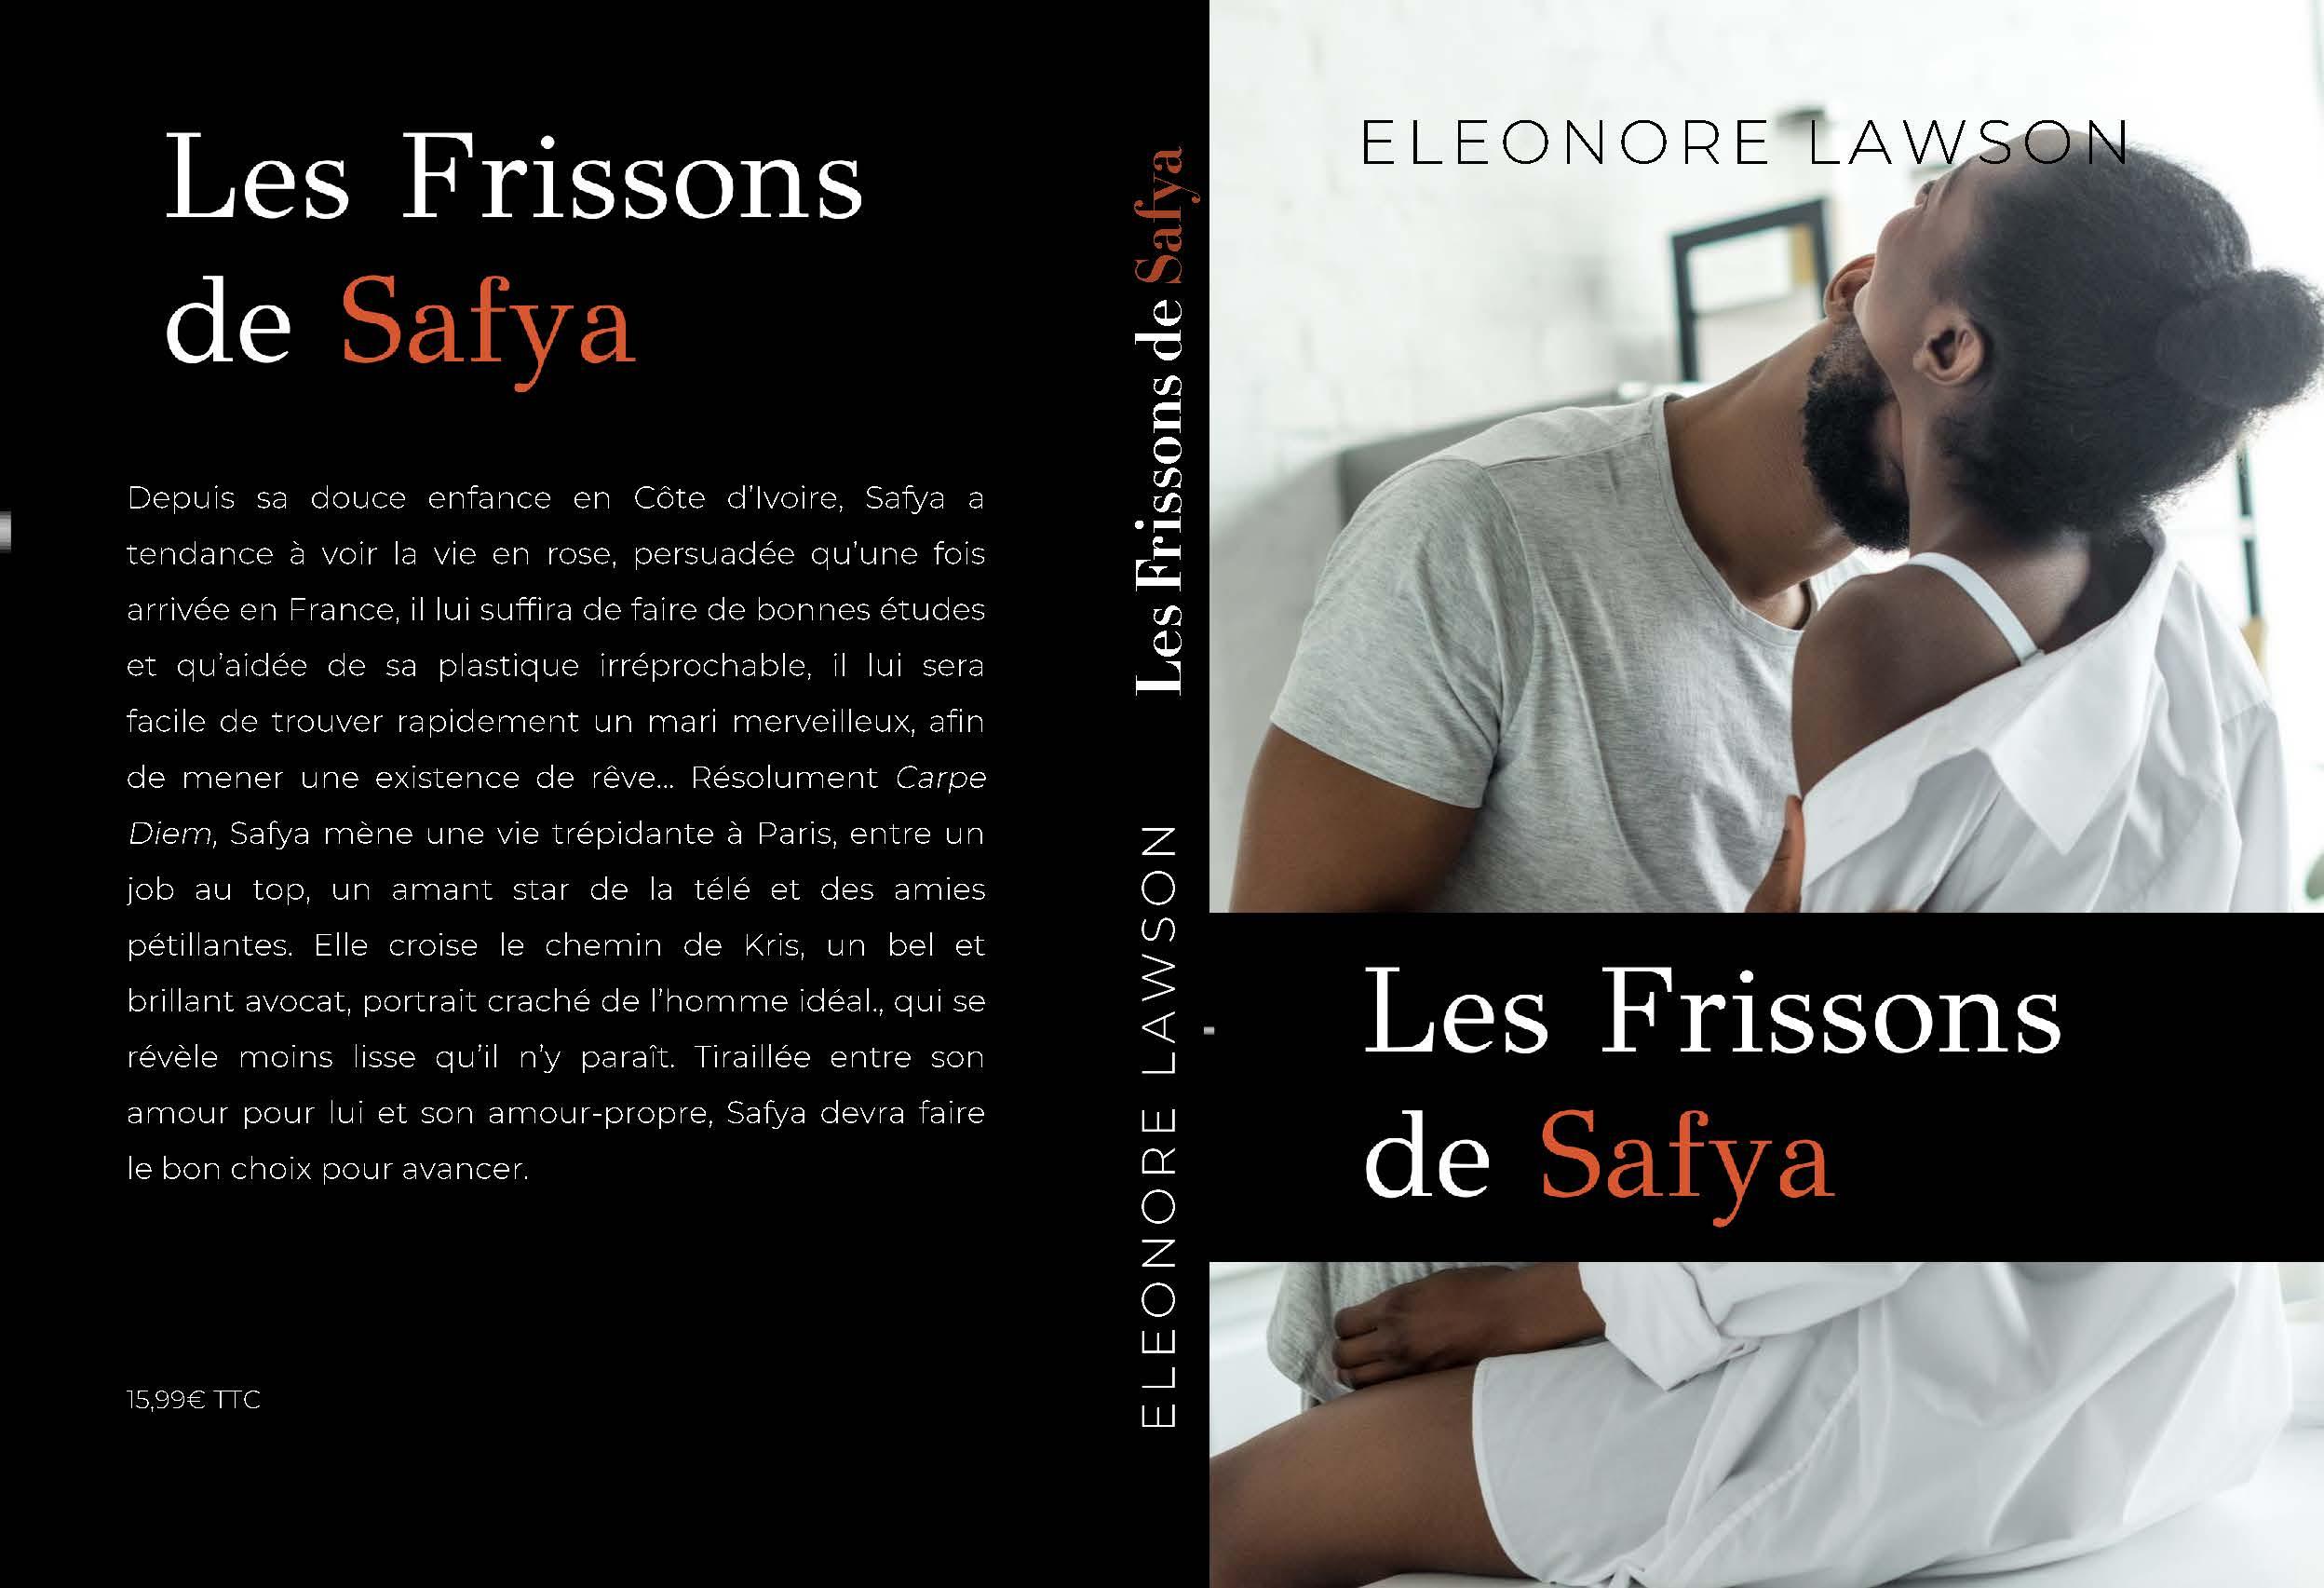 Les Frissons de Safya